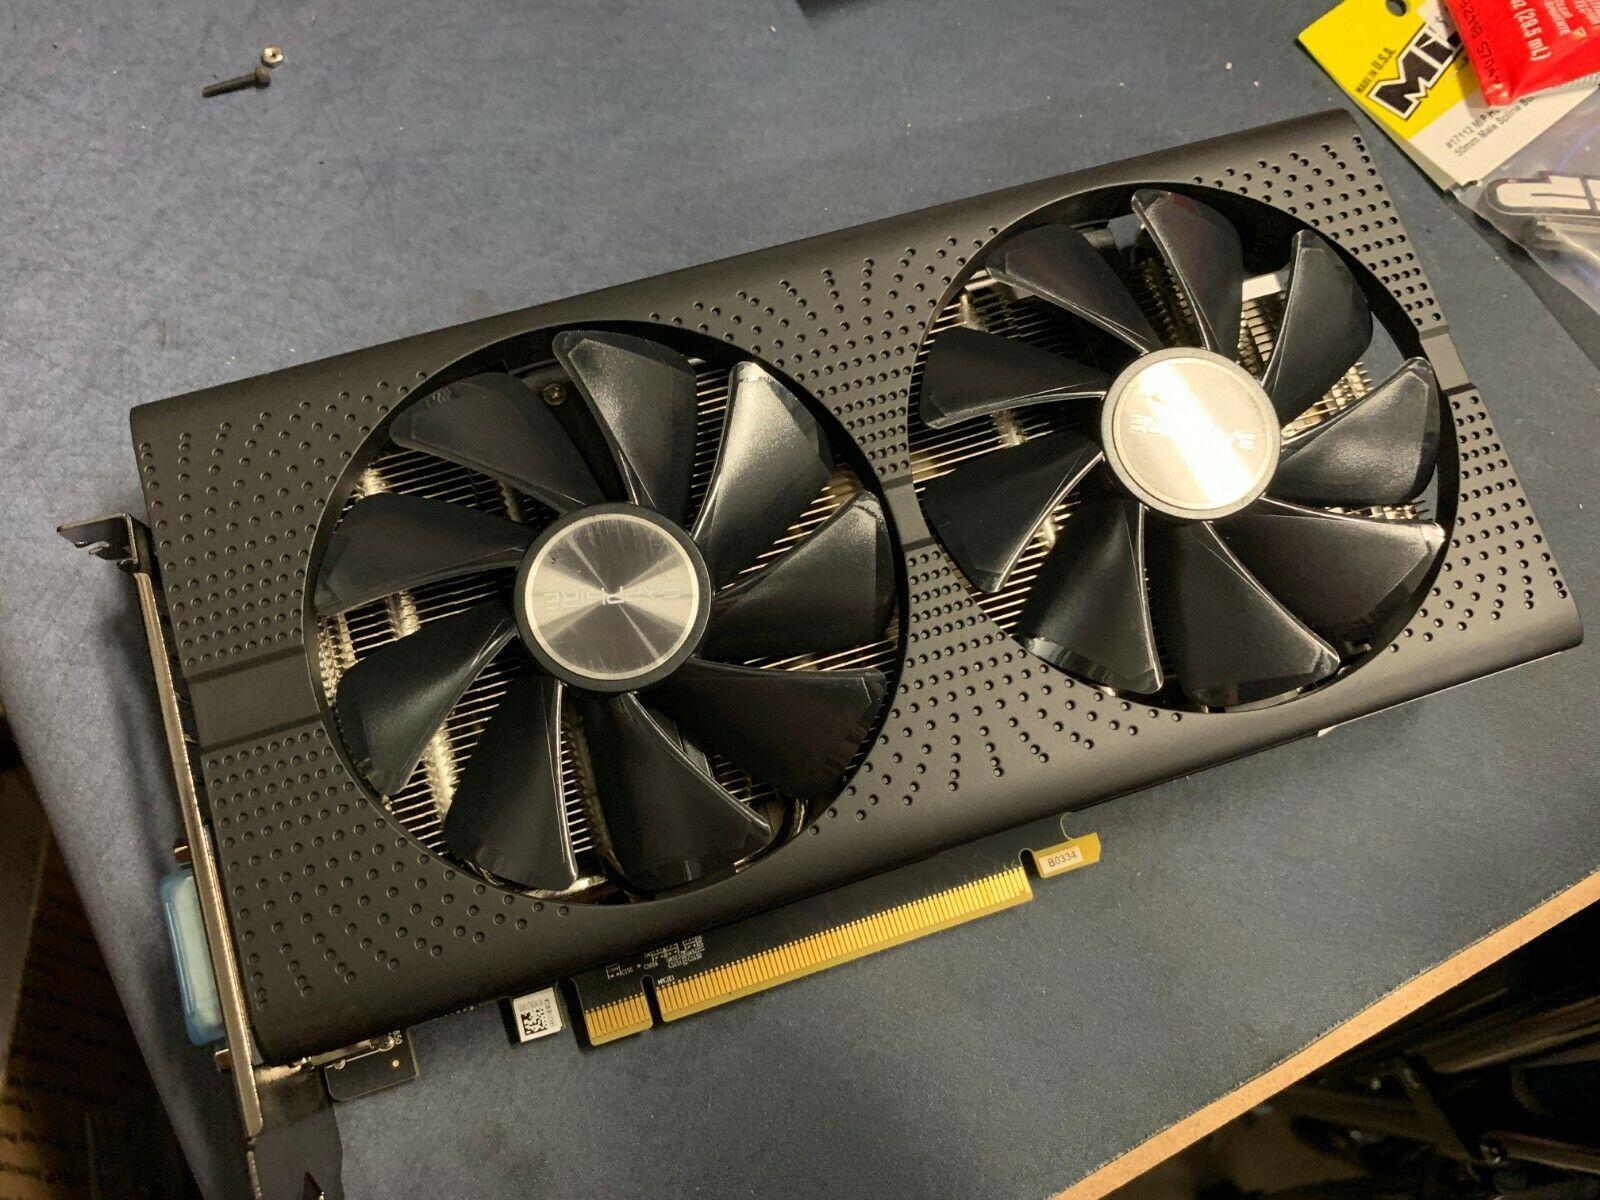 XFX Radeon R9 390X 8GB R9-390X-8256 GDDR5 PCI-E Gaming Video Graphics Card